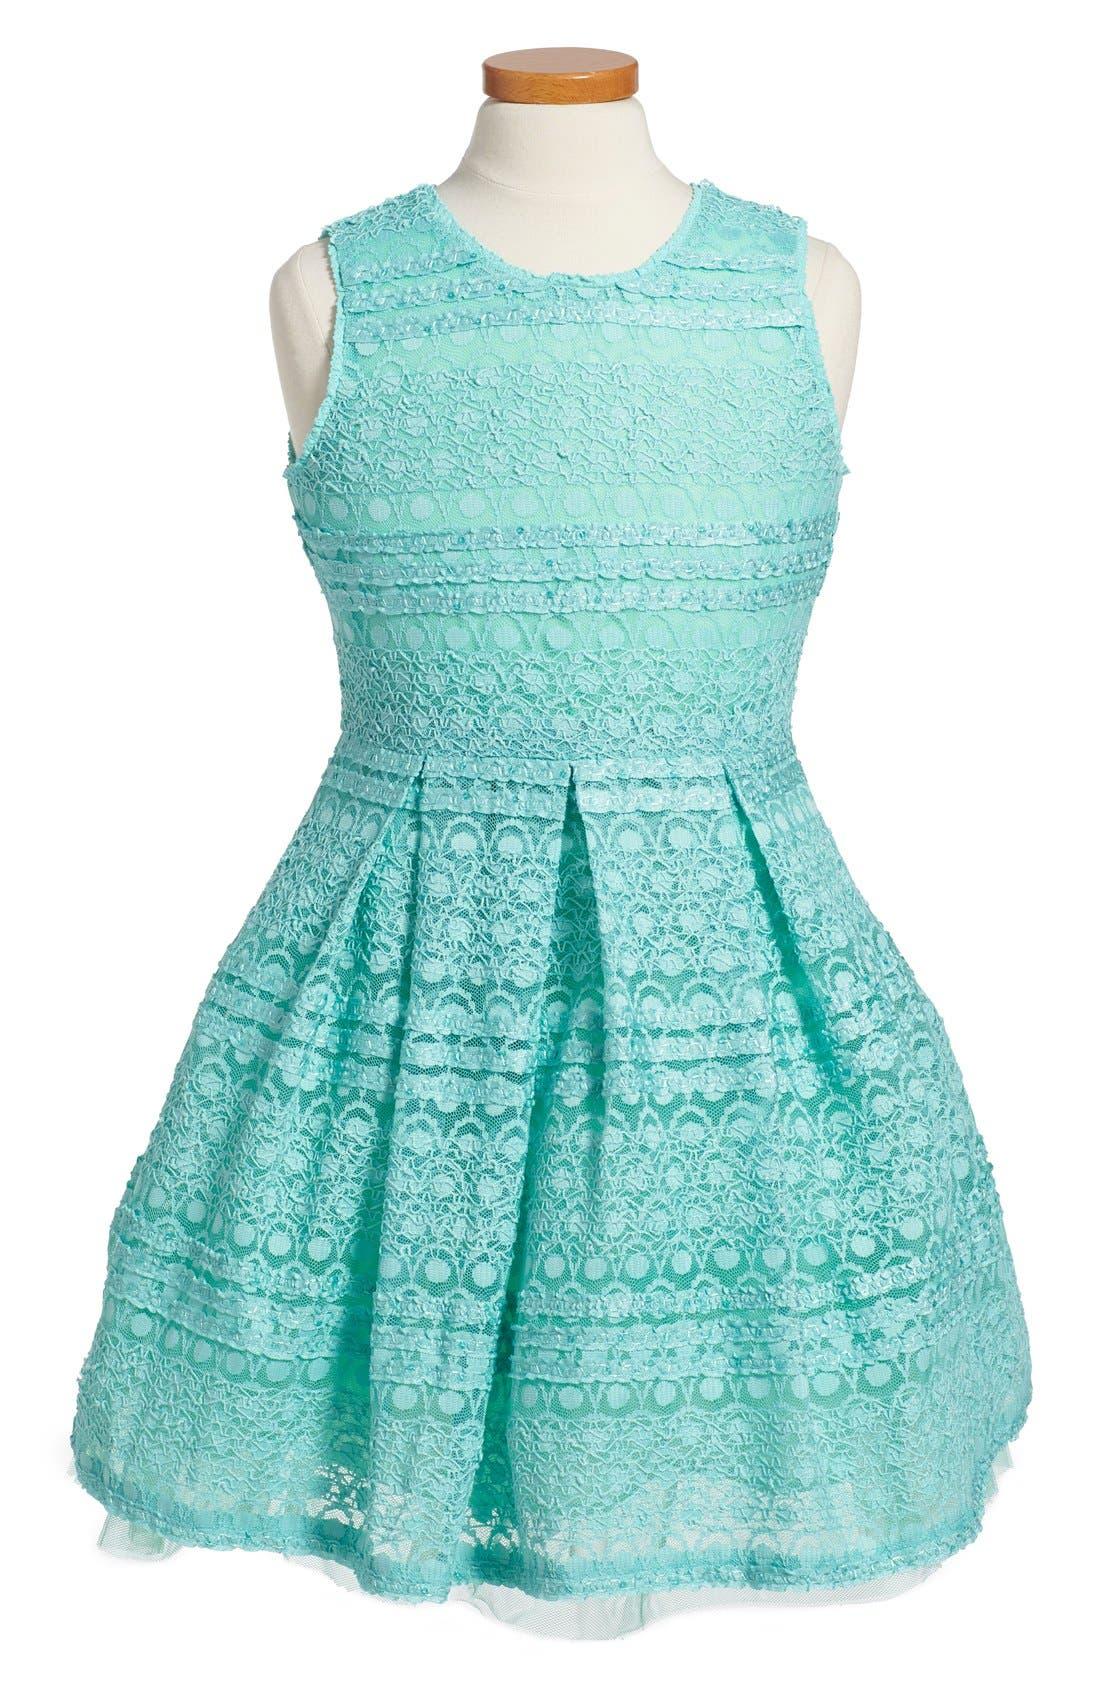 Alternate Image 1 Selected - Soprano Lace Skater Dress (Big Girls)